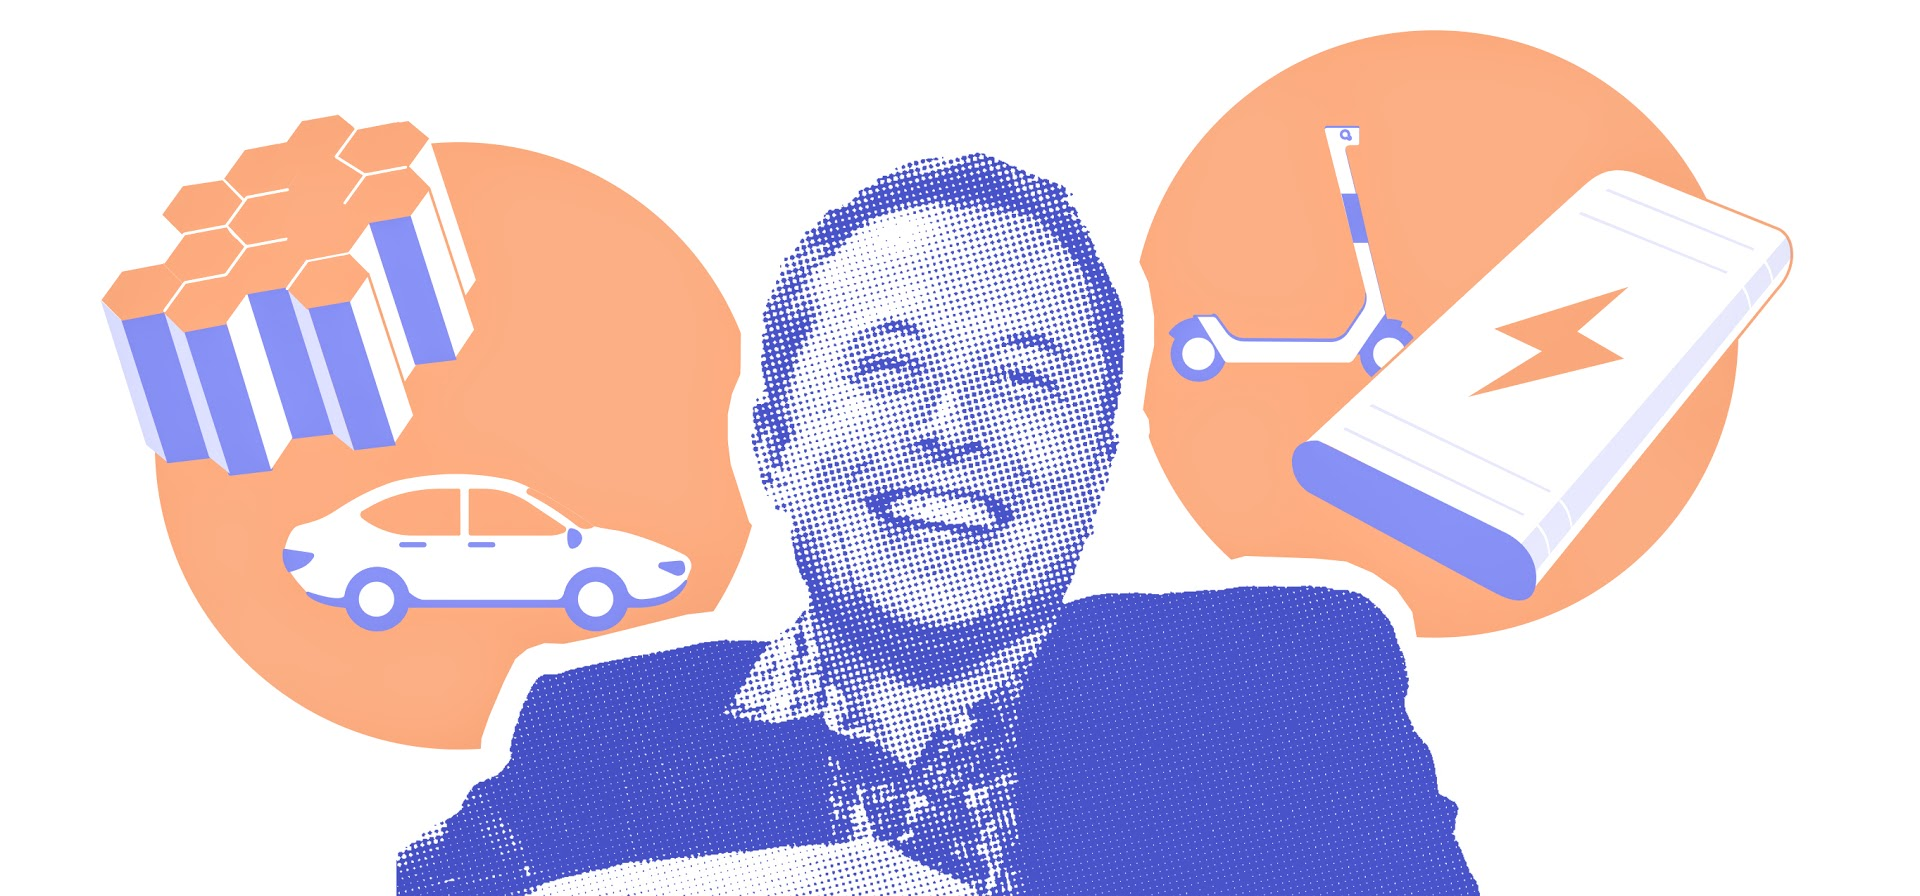 Illustration of Elon Musk and batteries